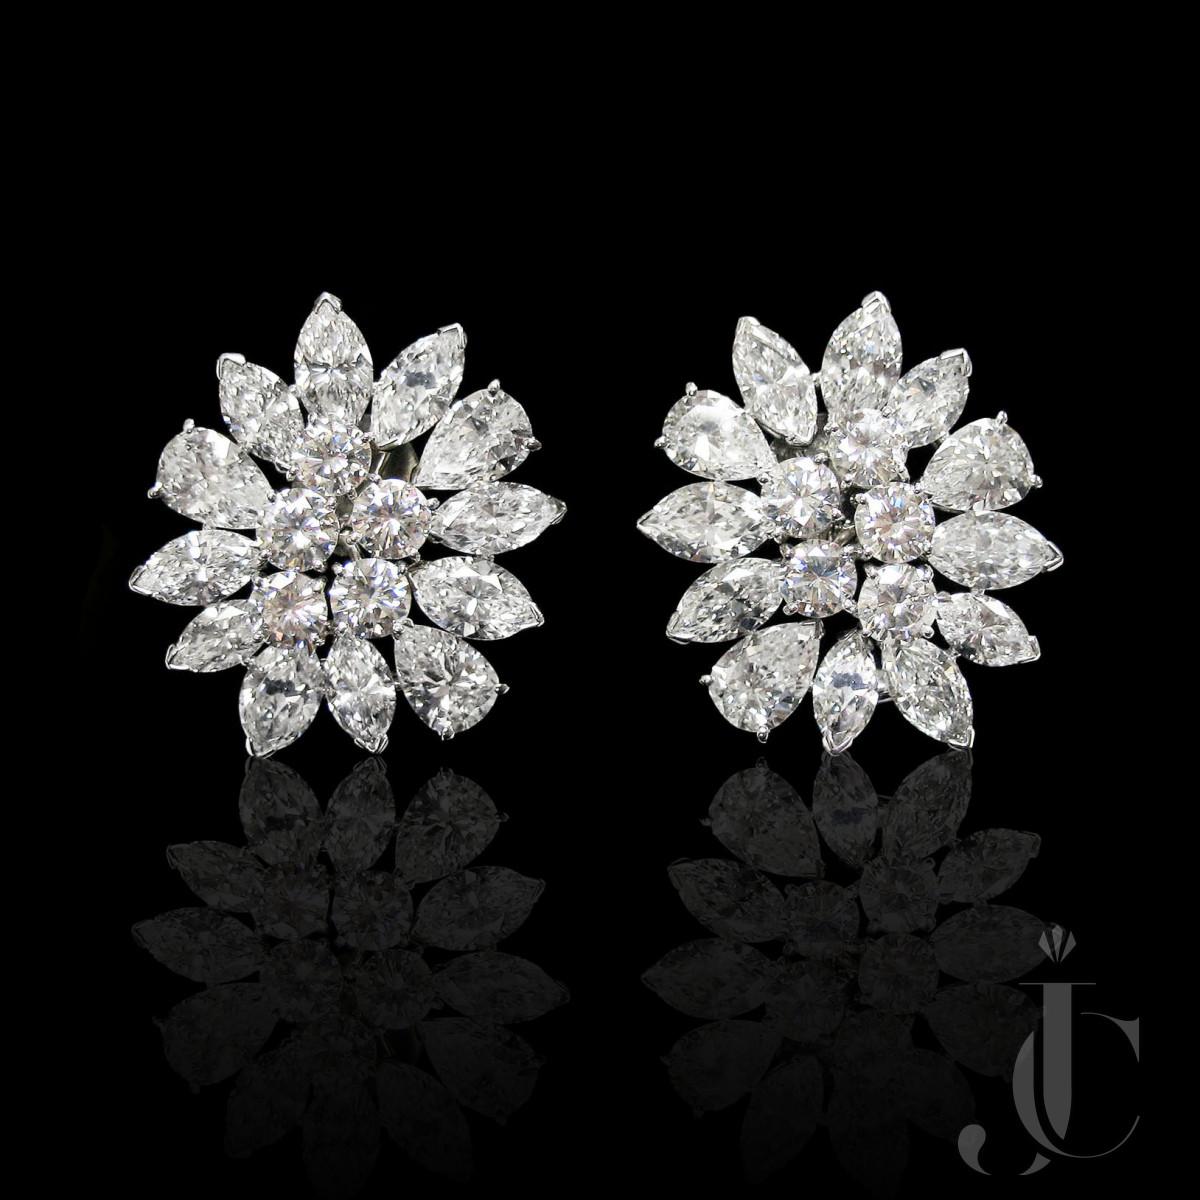 Platinum Diamond Cluster Earrings, circa 1965